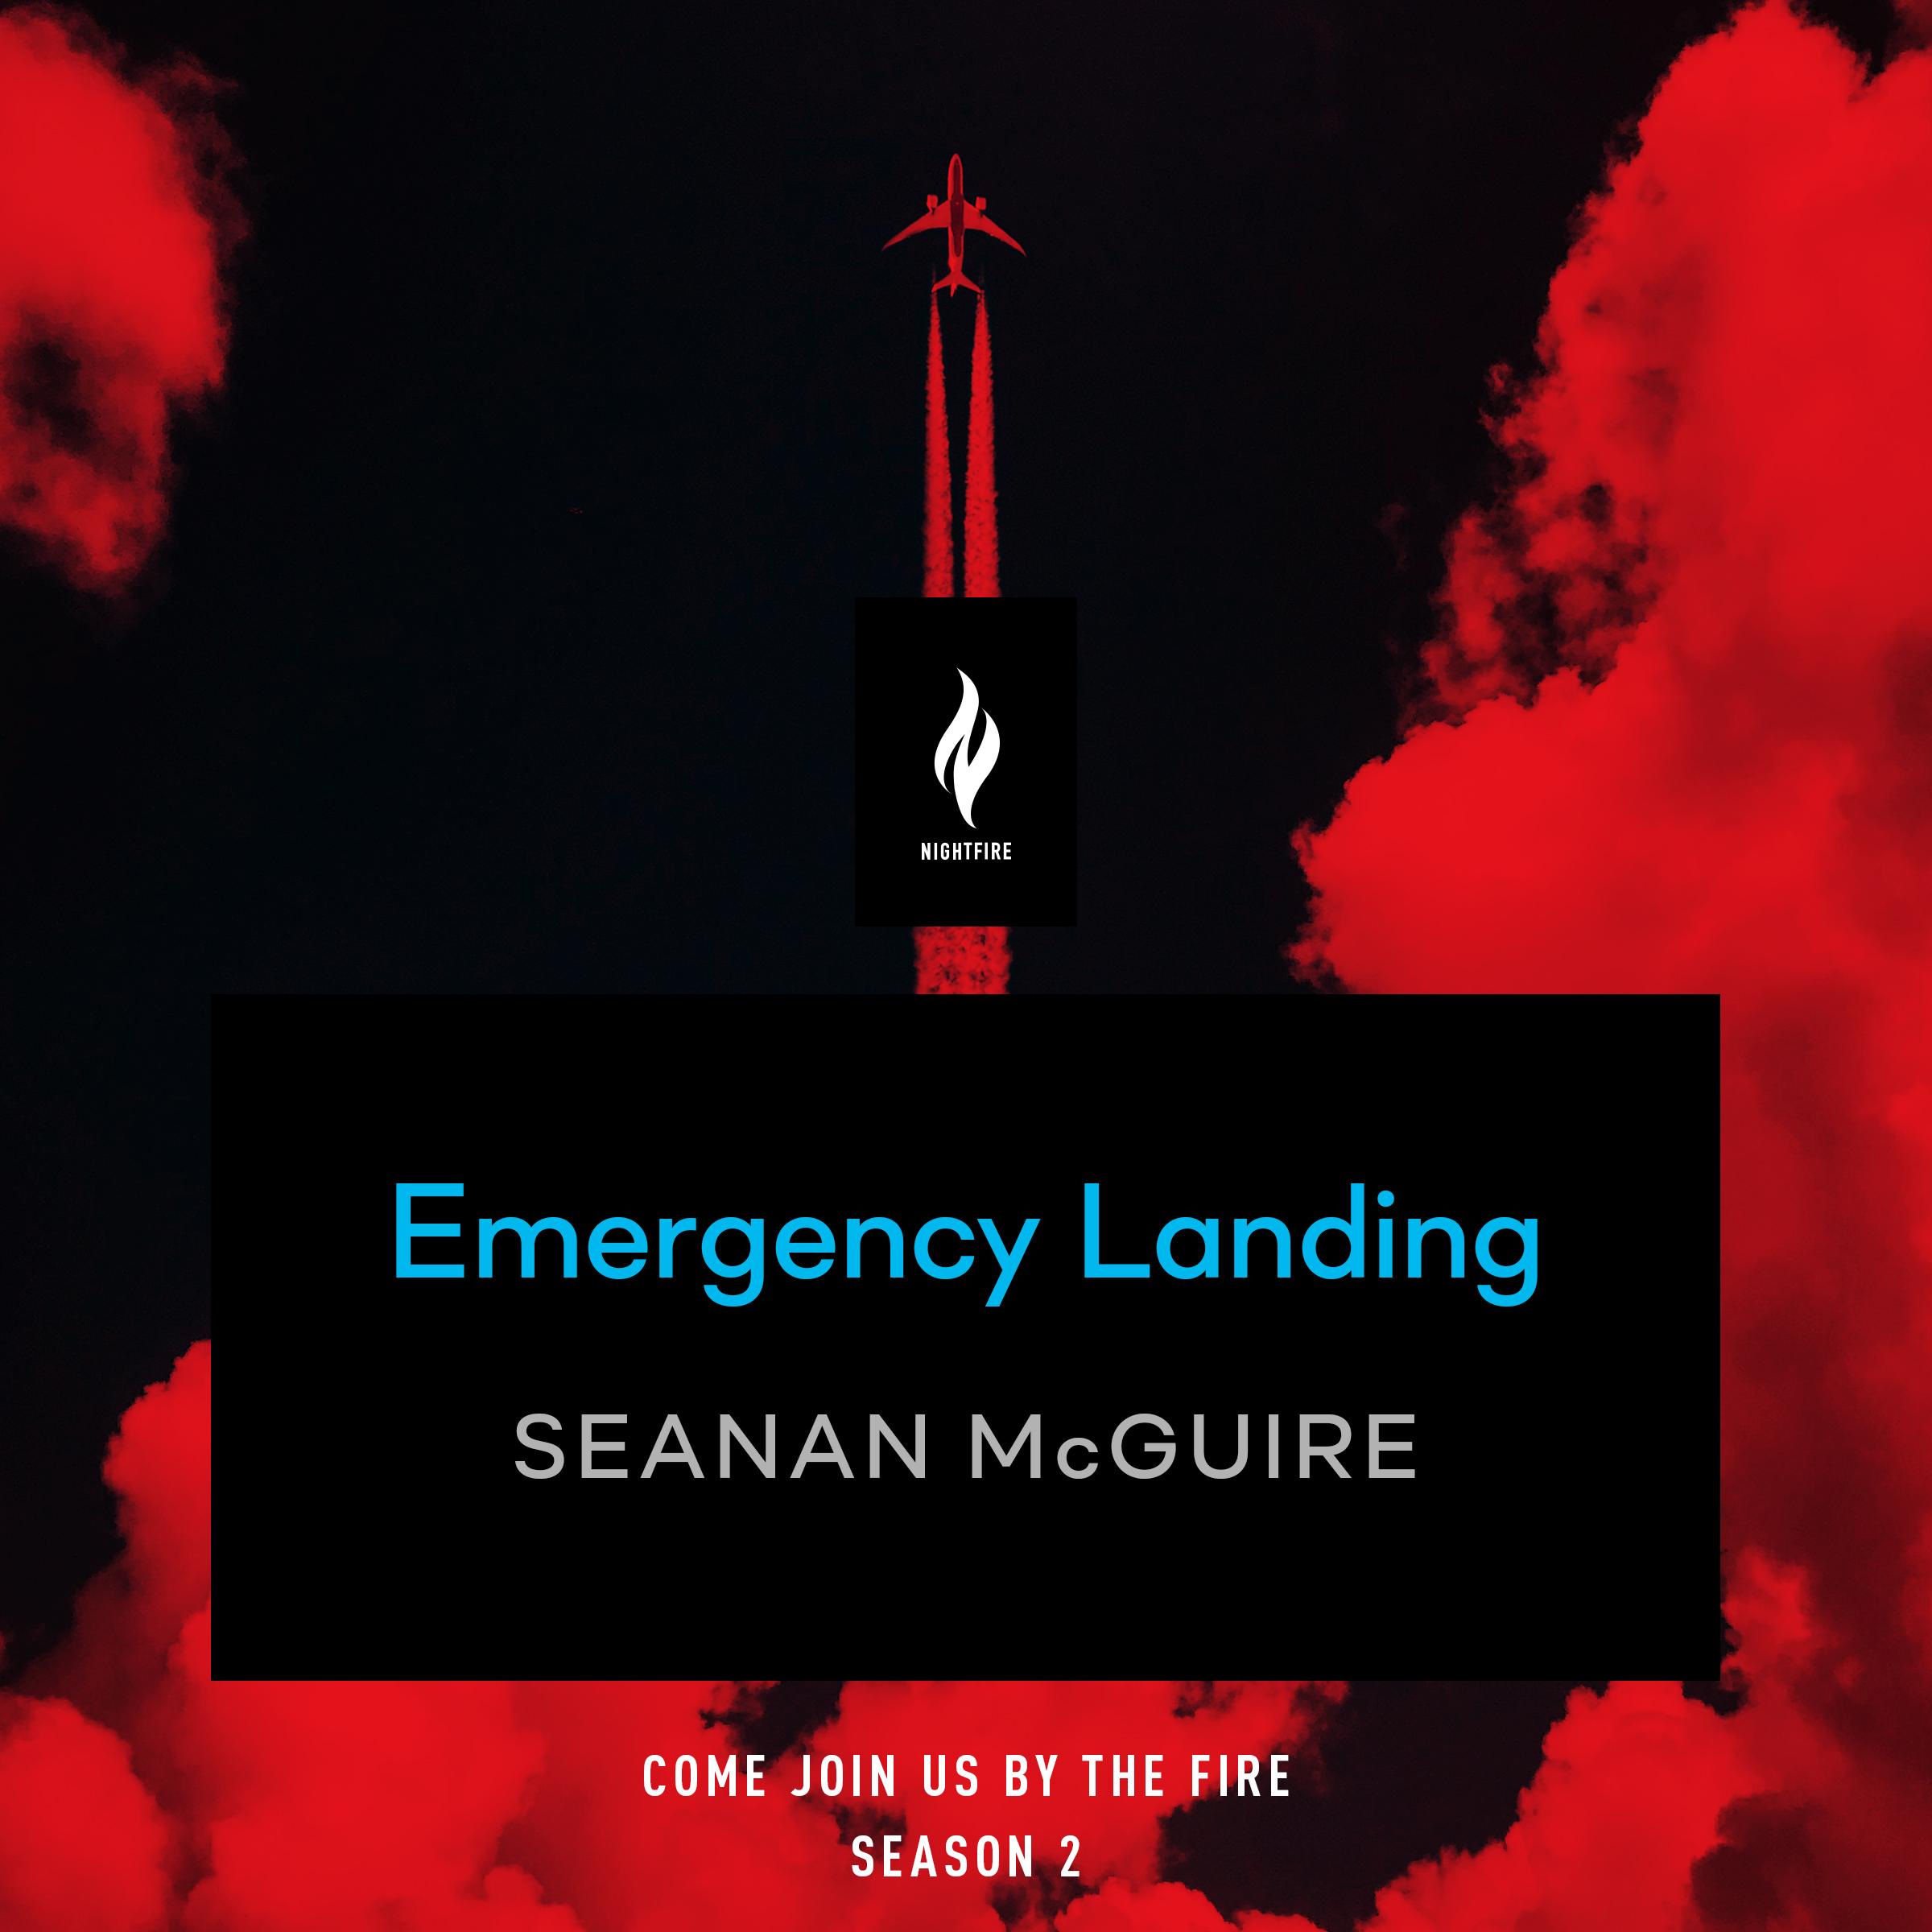 EmergencyLanding_McGuire